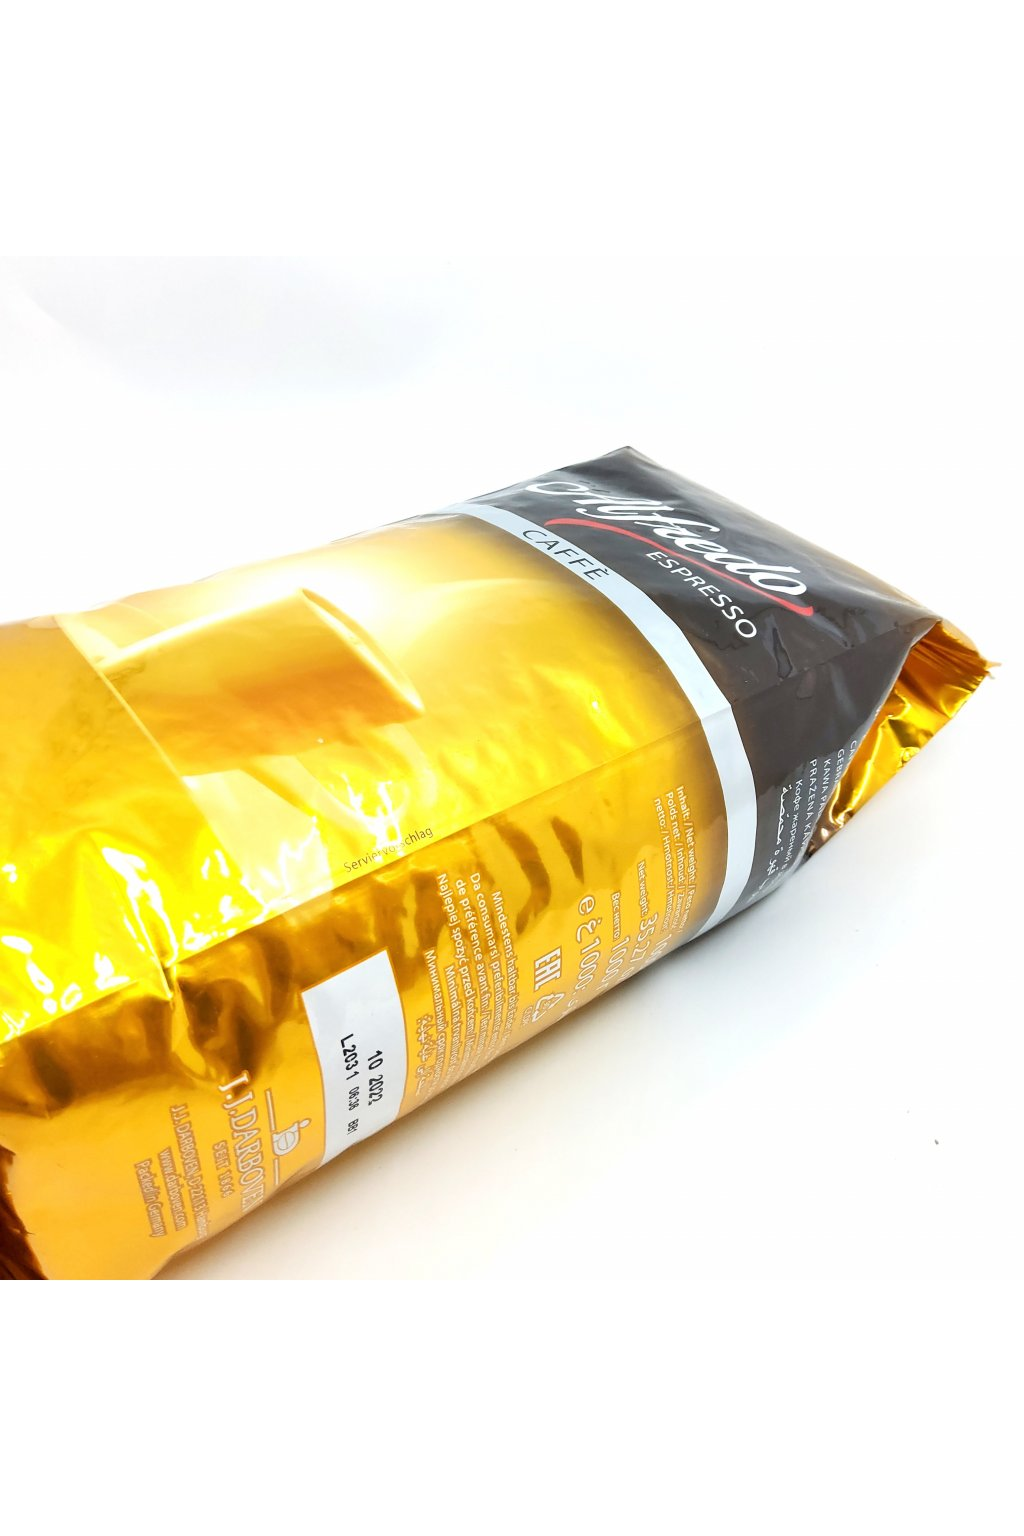 1187 alfredo espresso caffe zrnkova kava 1 kg